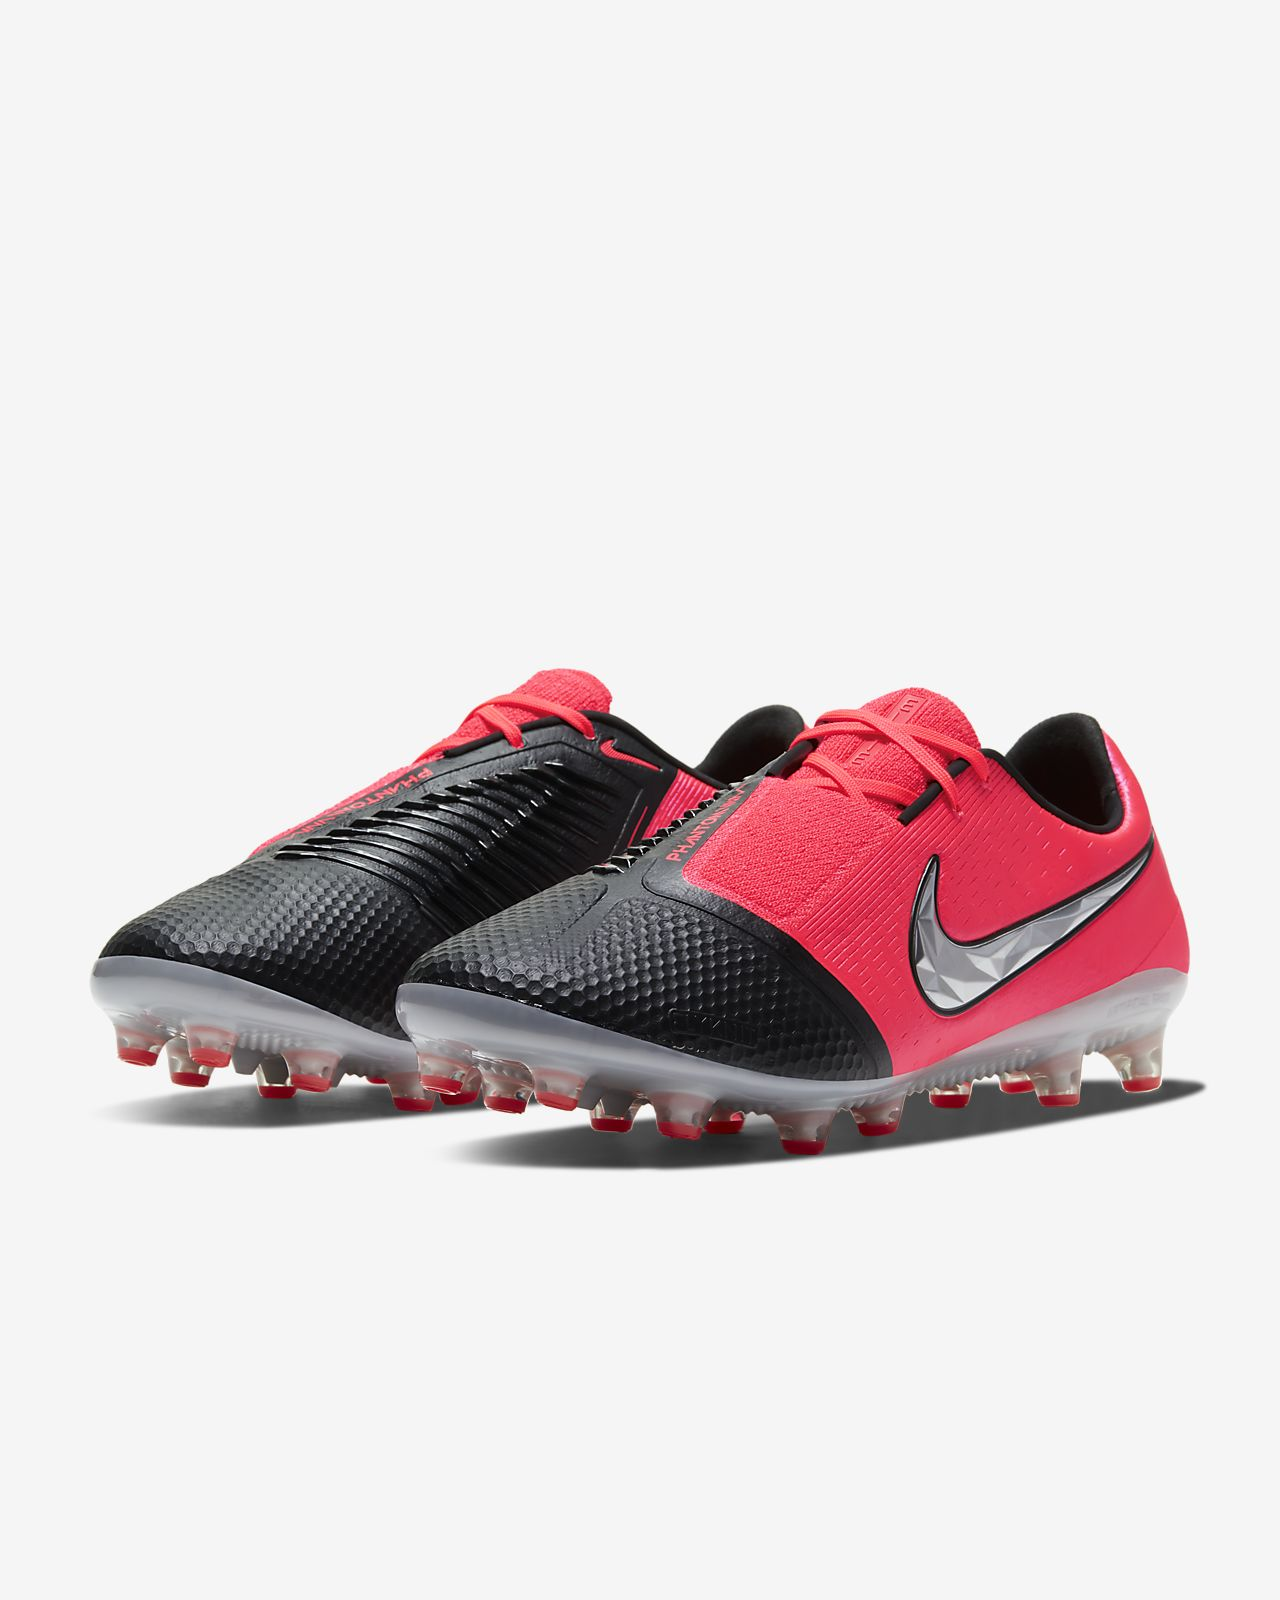 Nike Phantom Venom Pro AG PRO Football Boots